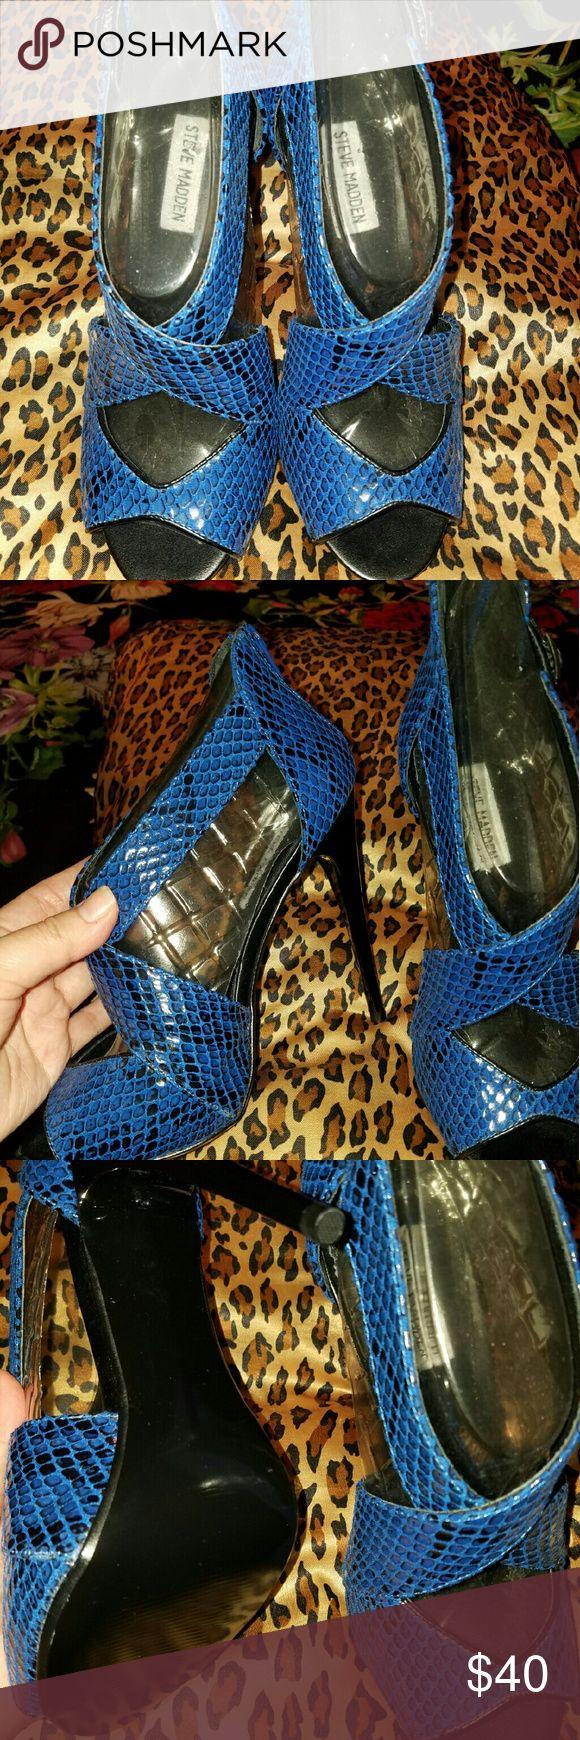 Steve madden high heels Exotic blue/black heels Steve Madden Shoes Heels